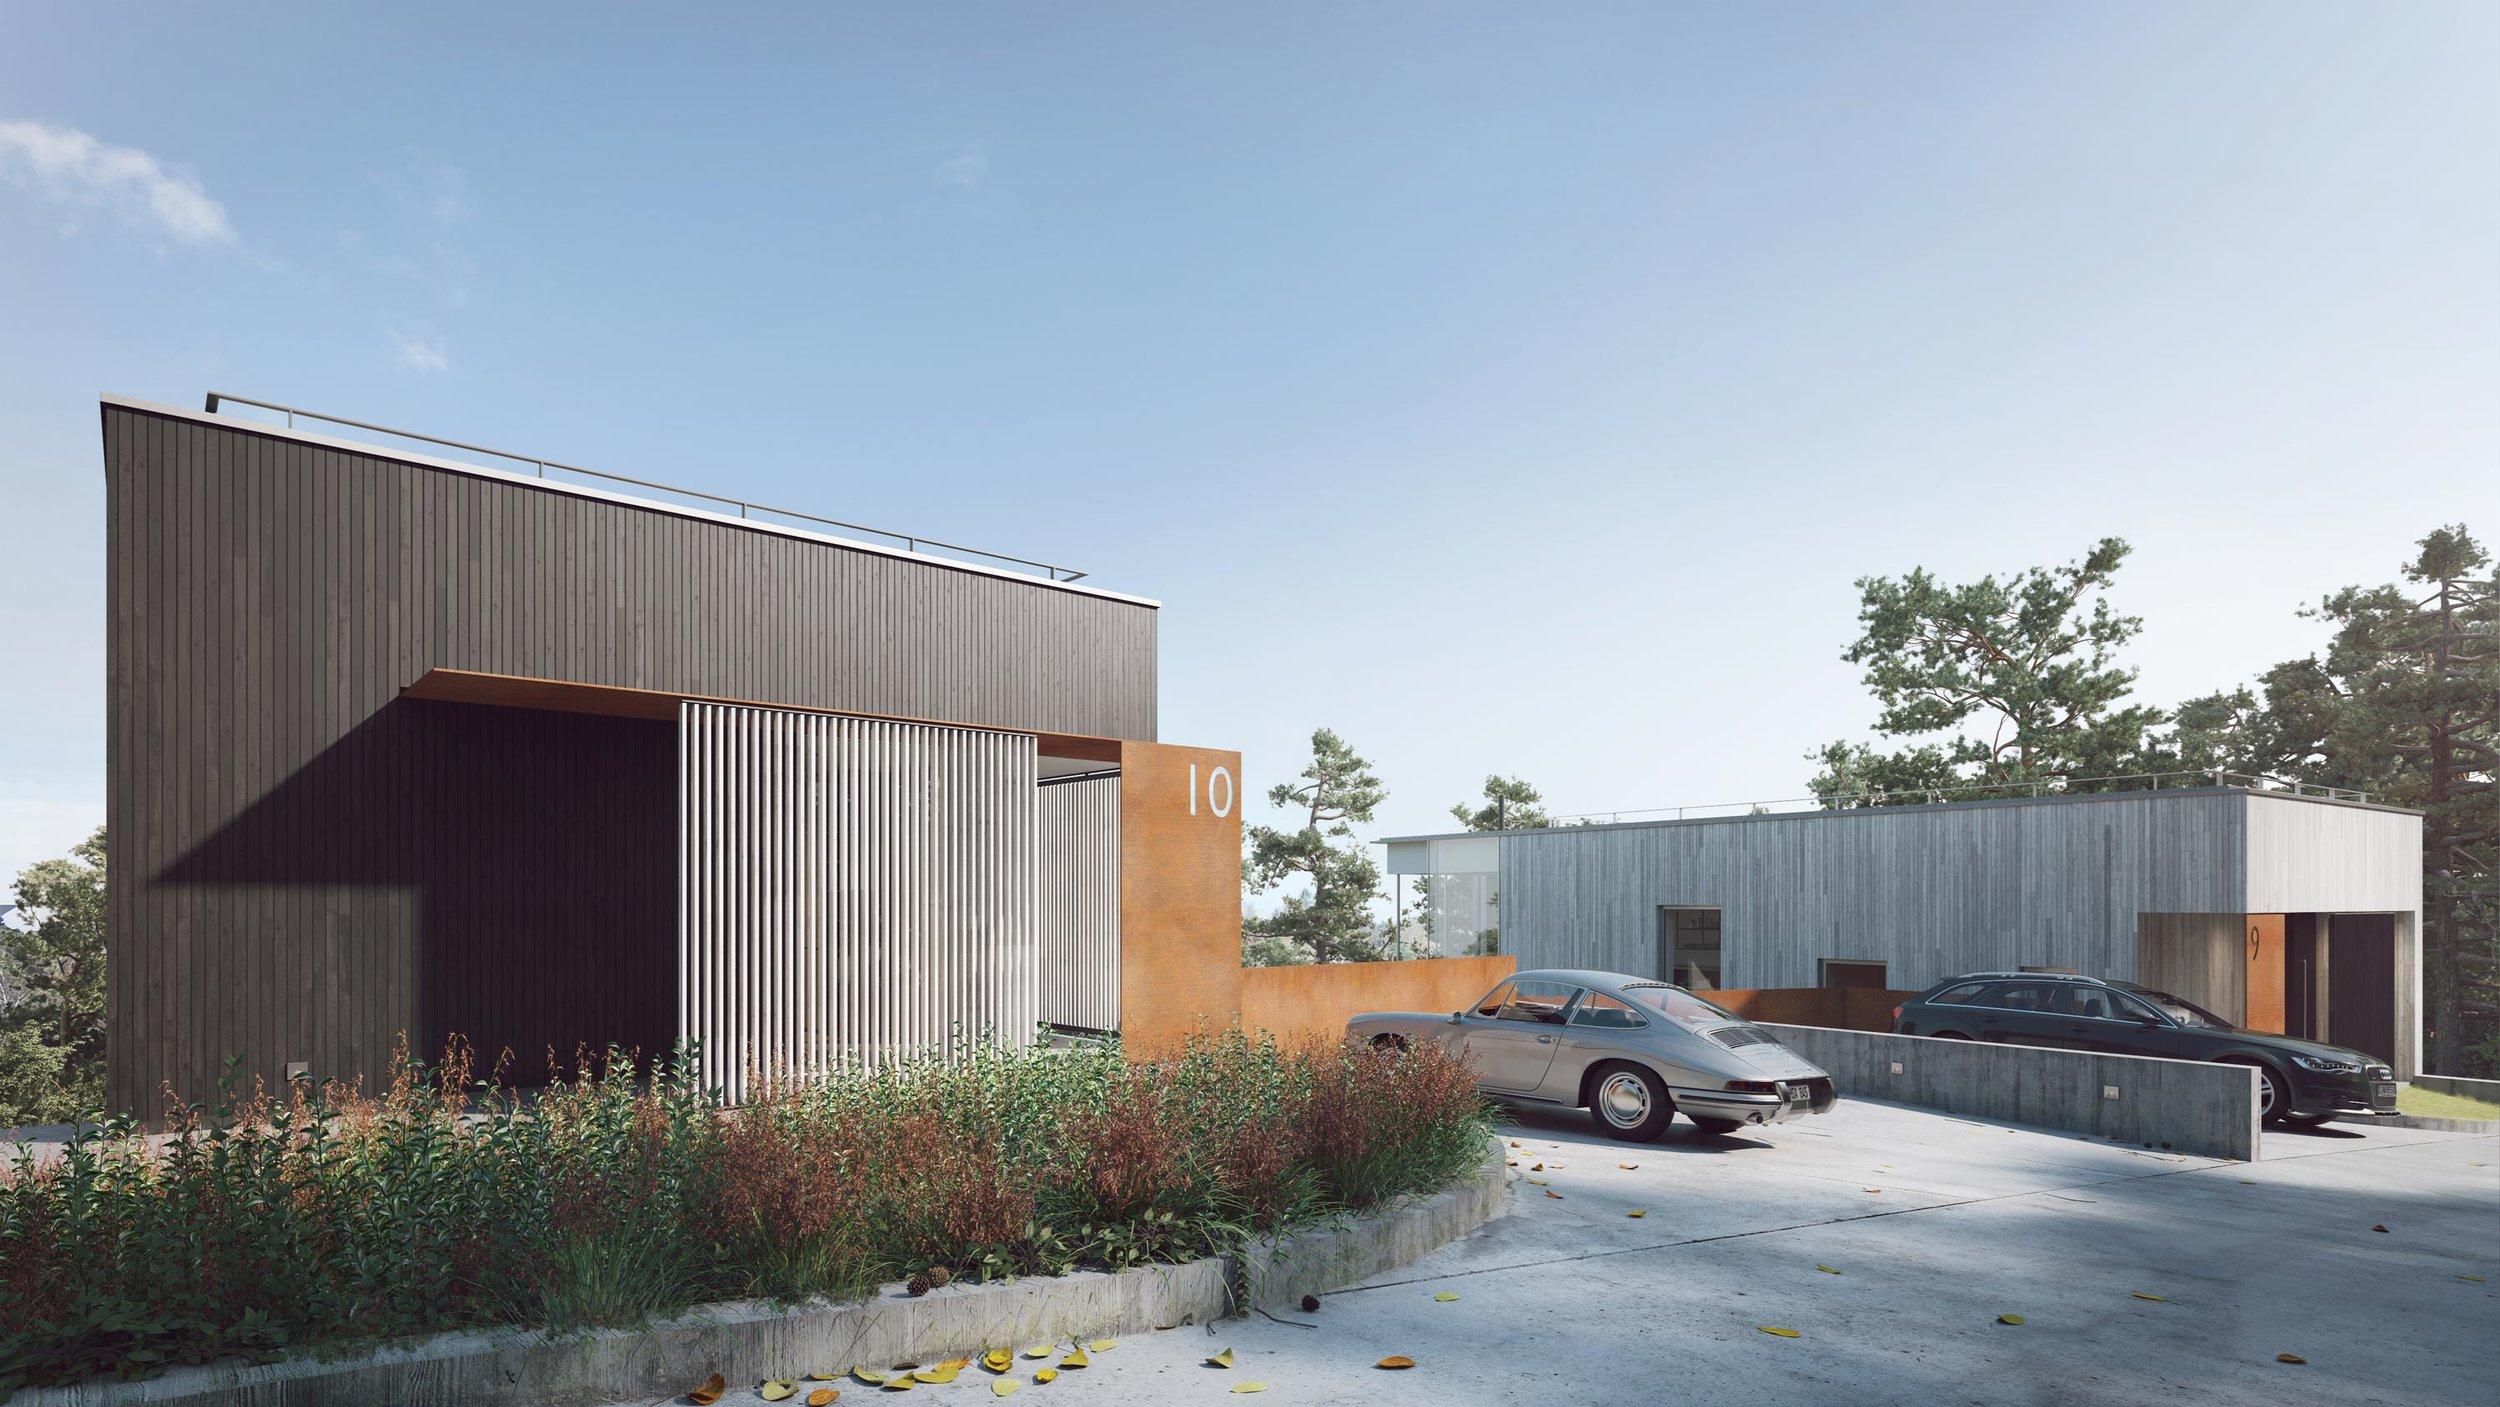 pyrus luxury villas, strom architects, imola, 3.jpg